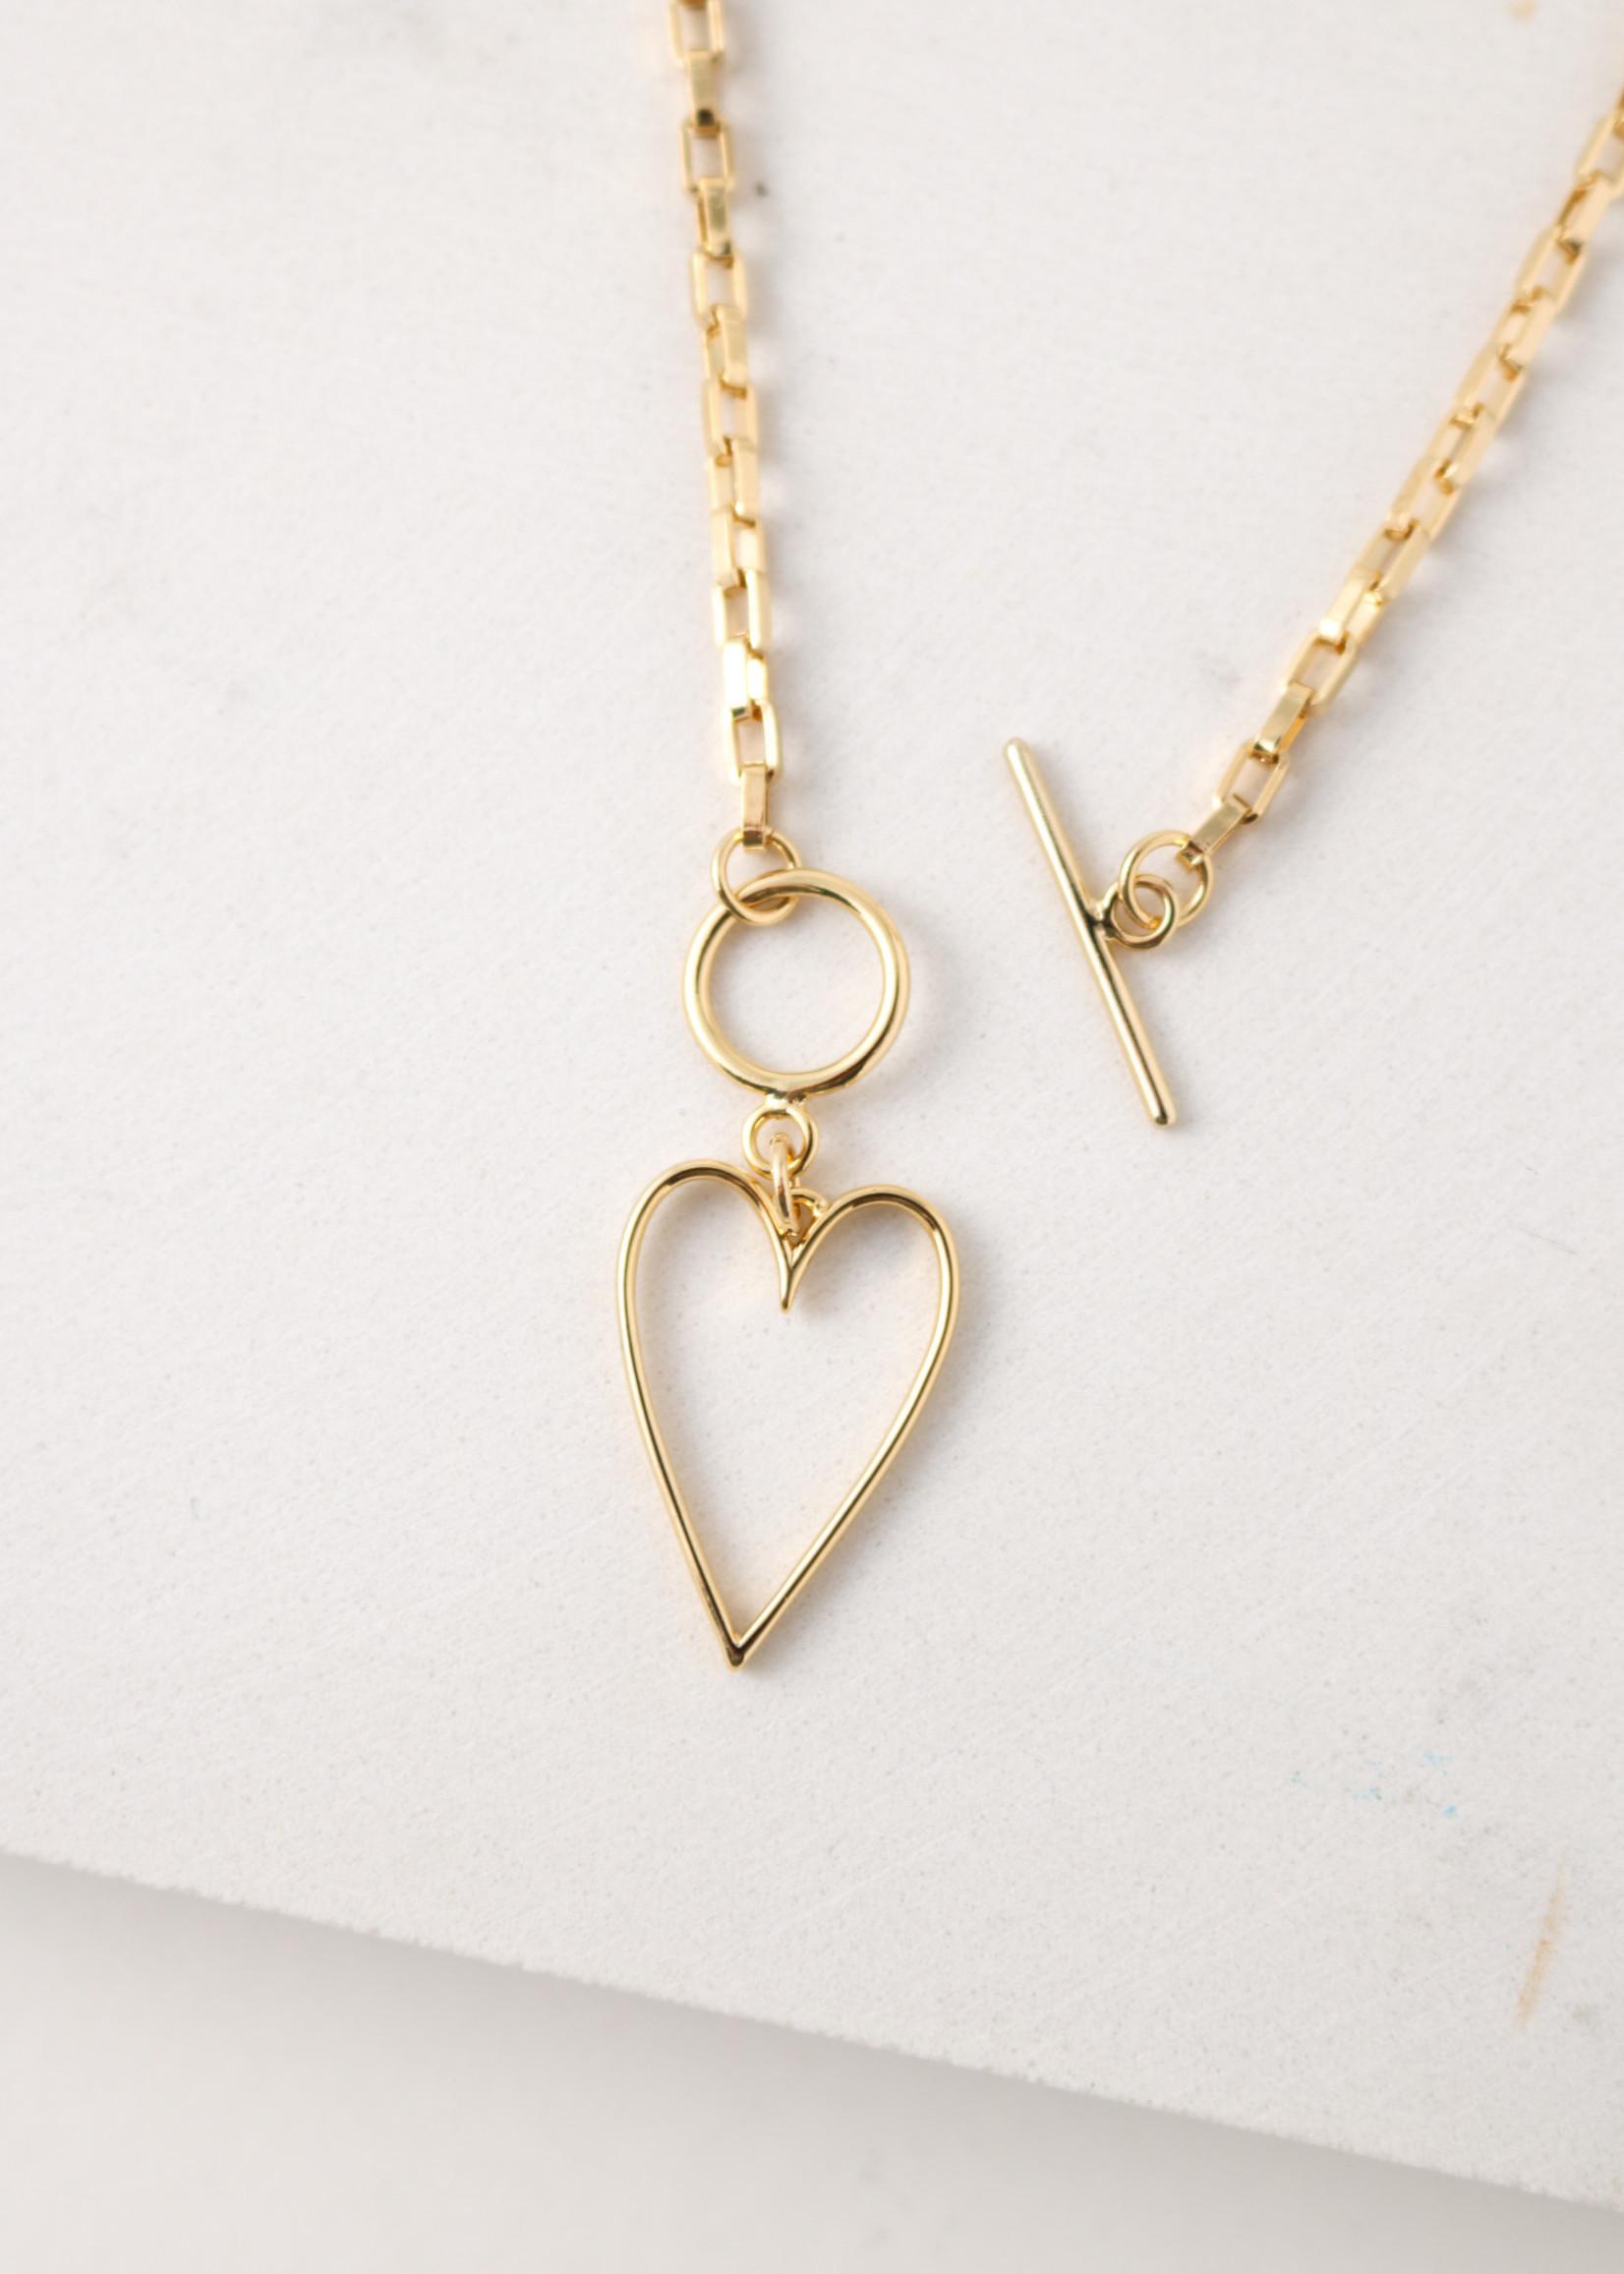 Lovestruck Heart Necklace Gold